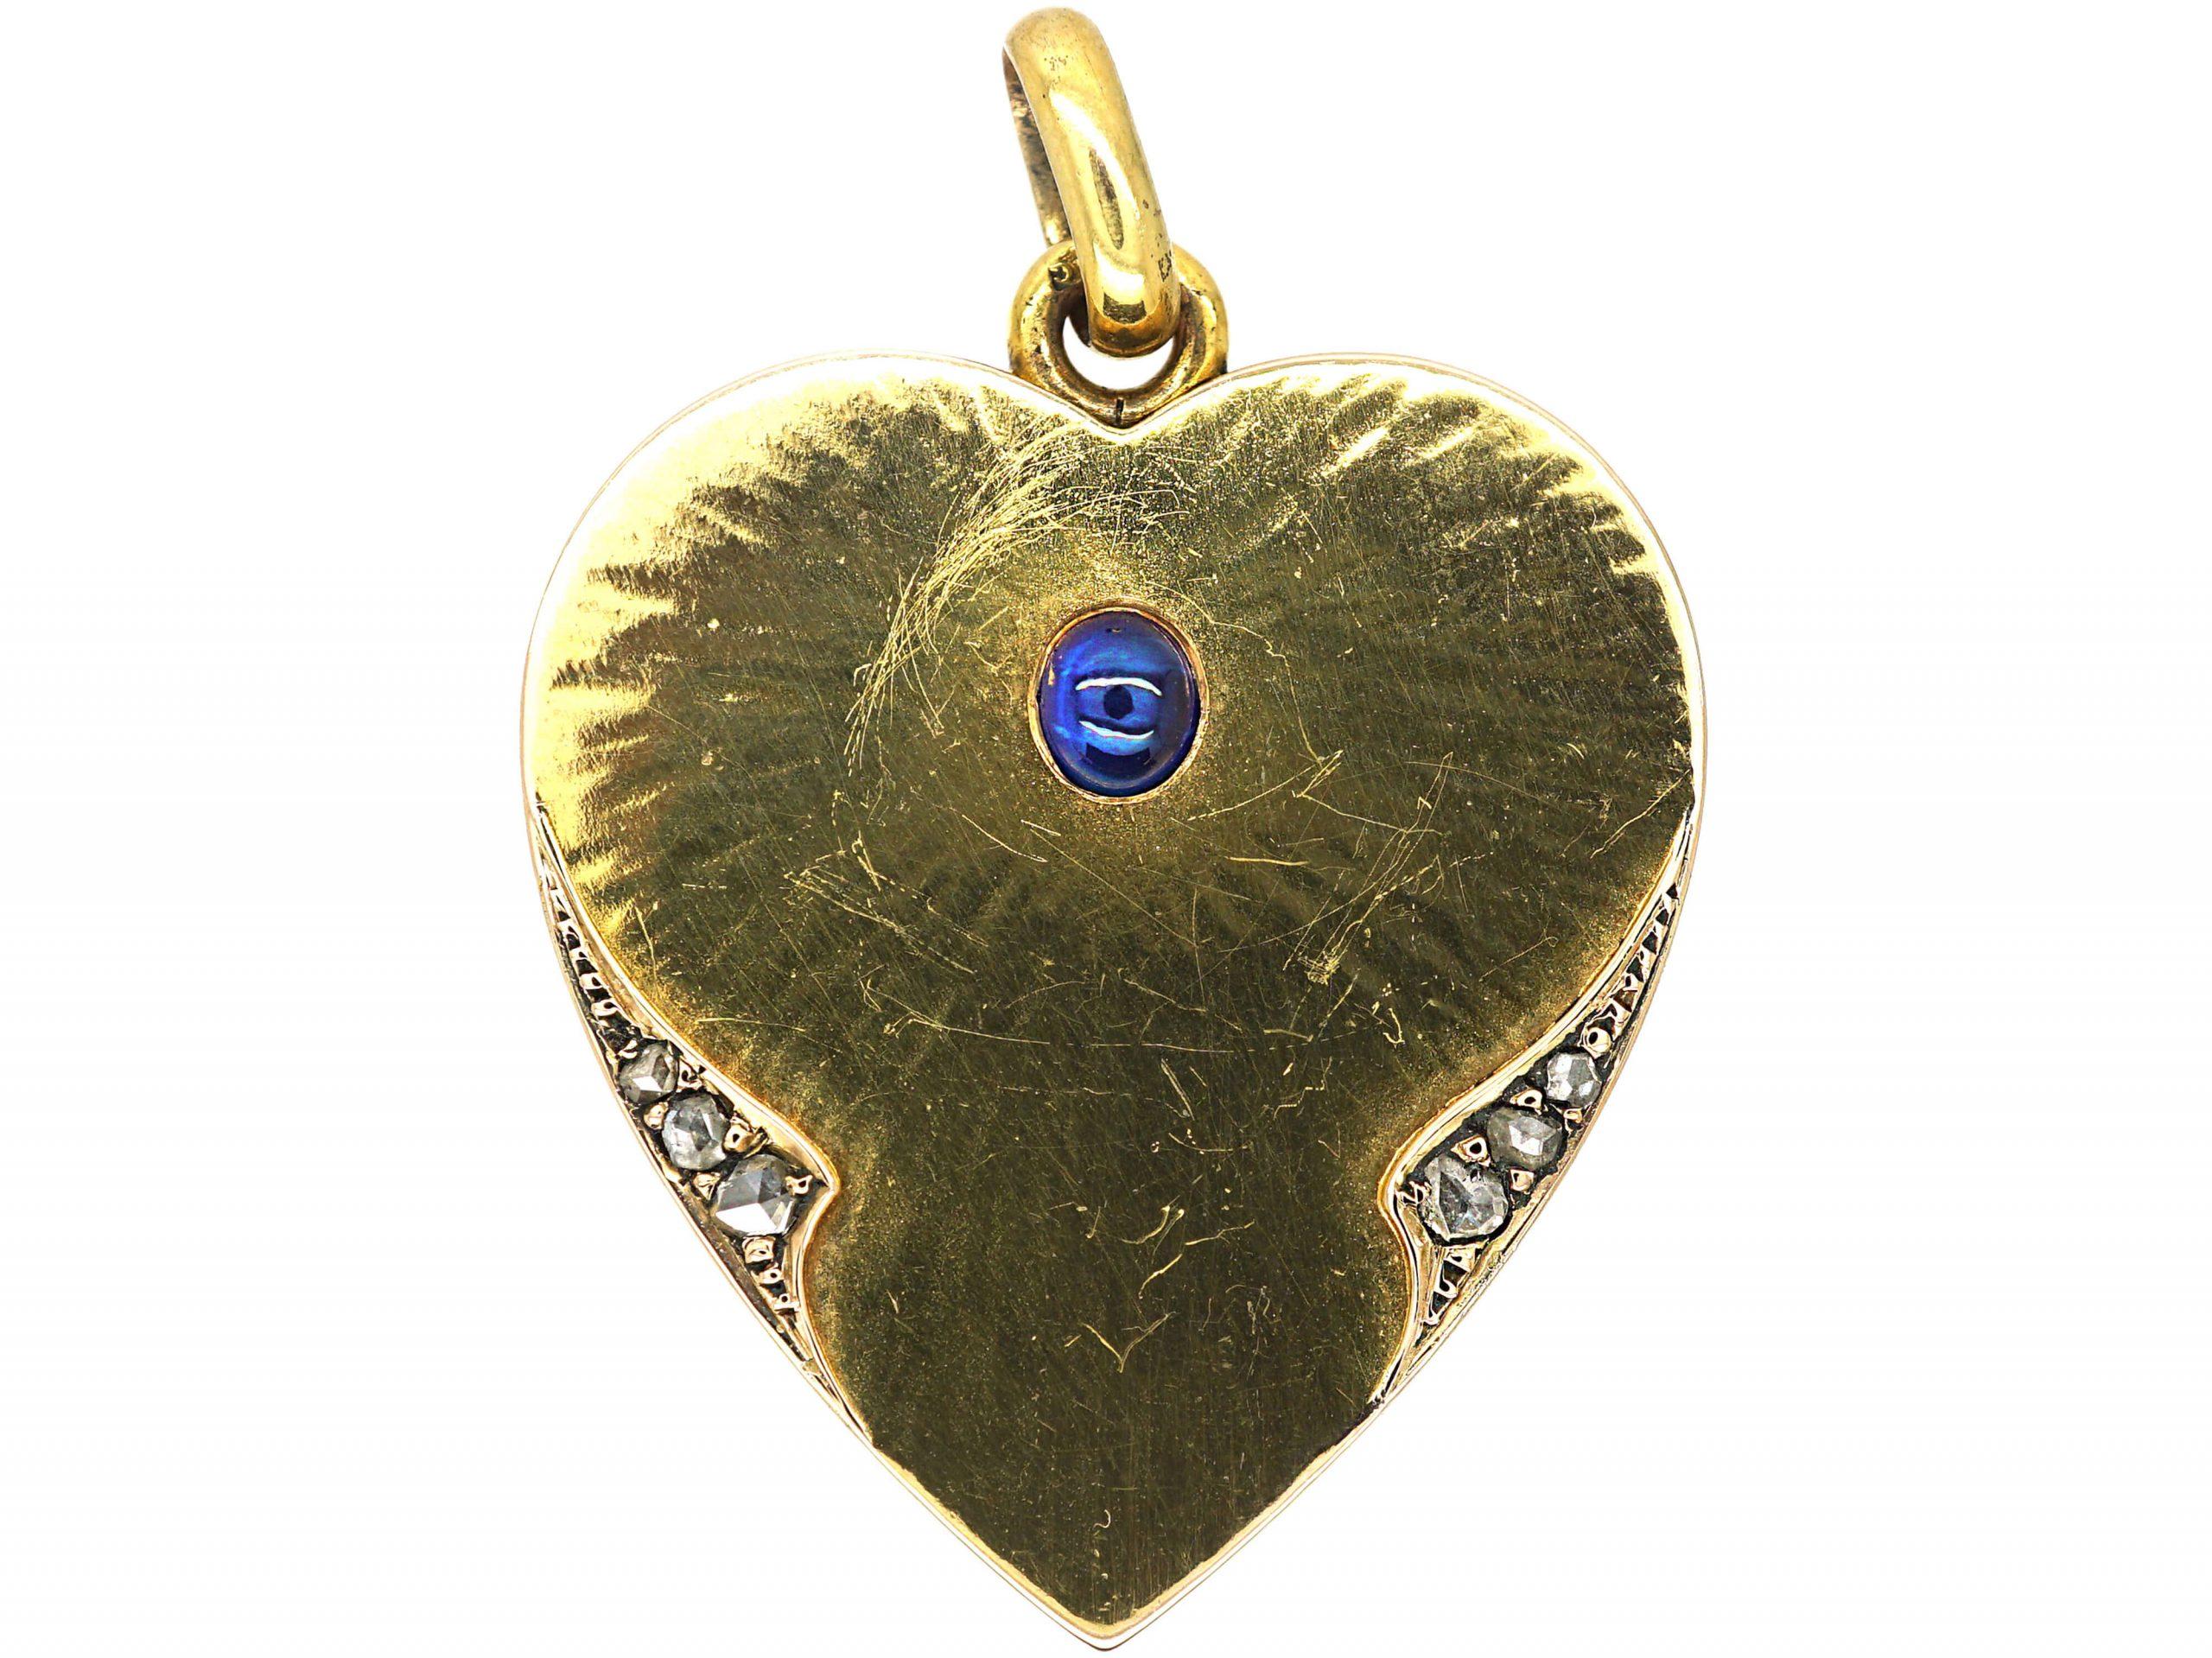 Art Deco 14ct Gold Heart Locket set with A Cabochon Sapphire & Rose Diamonds